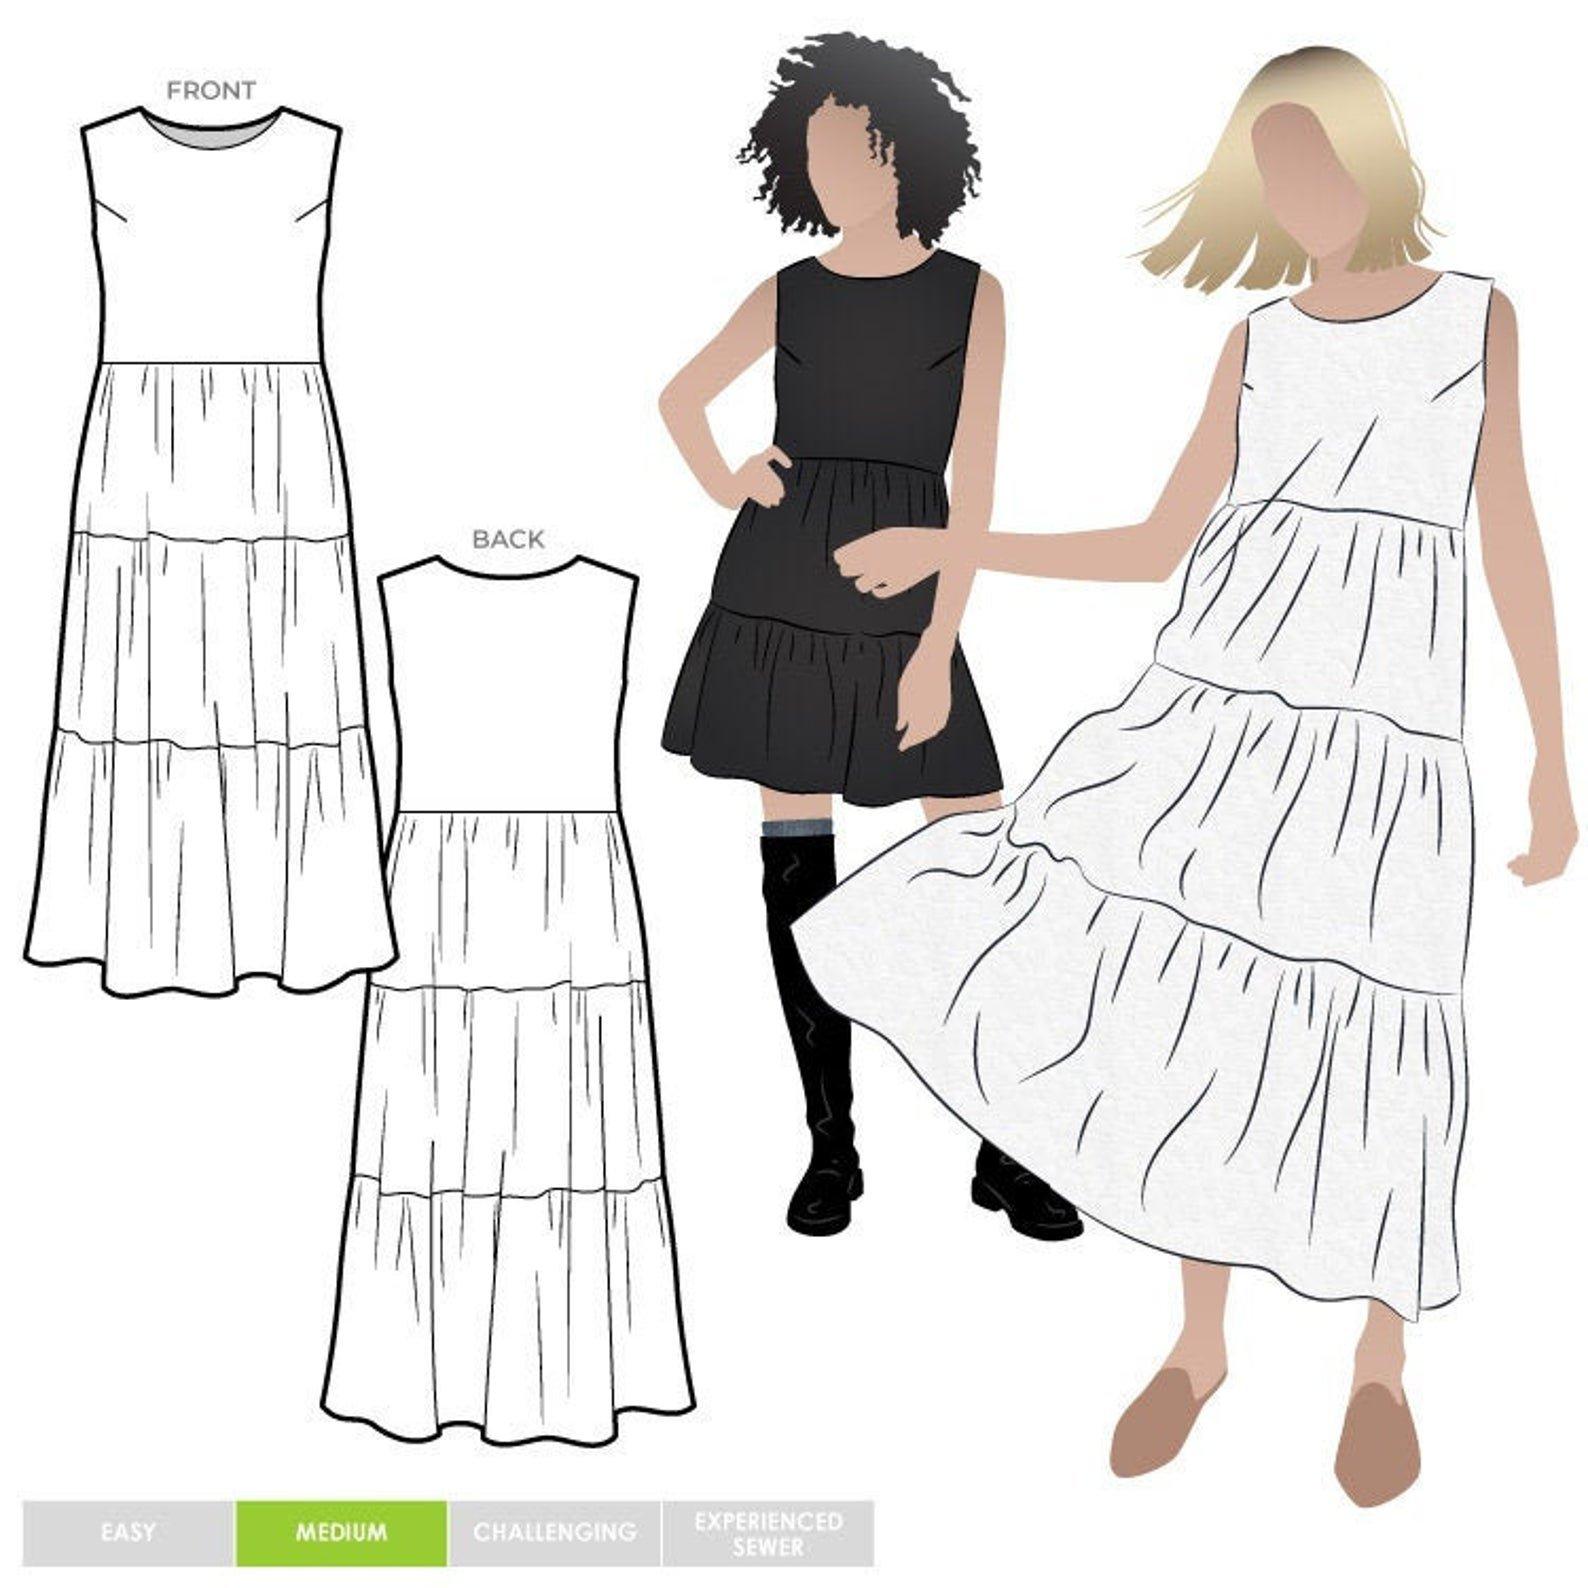 Style Arc Nova Midi Dress - Sizes 4-16 or 18-30